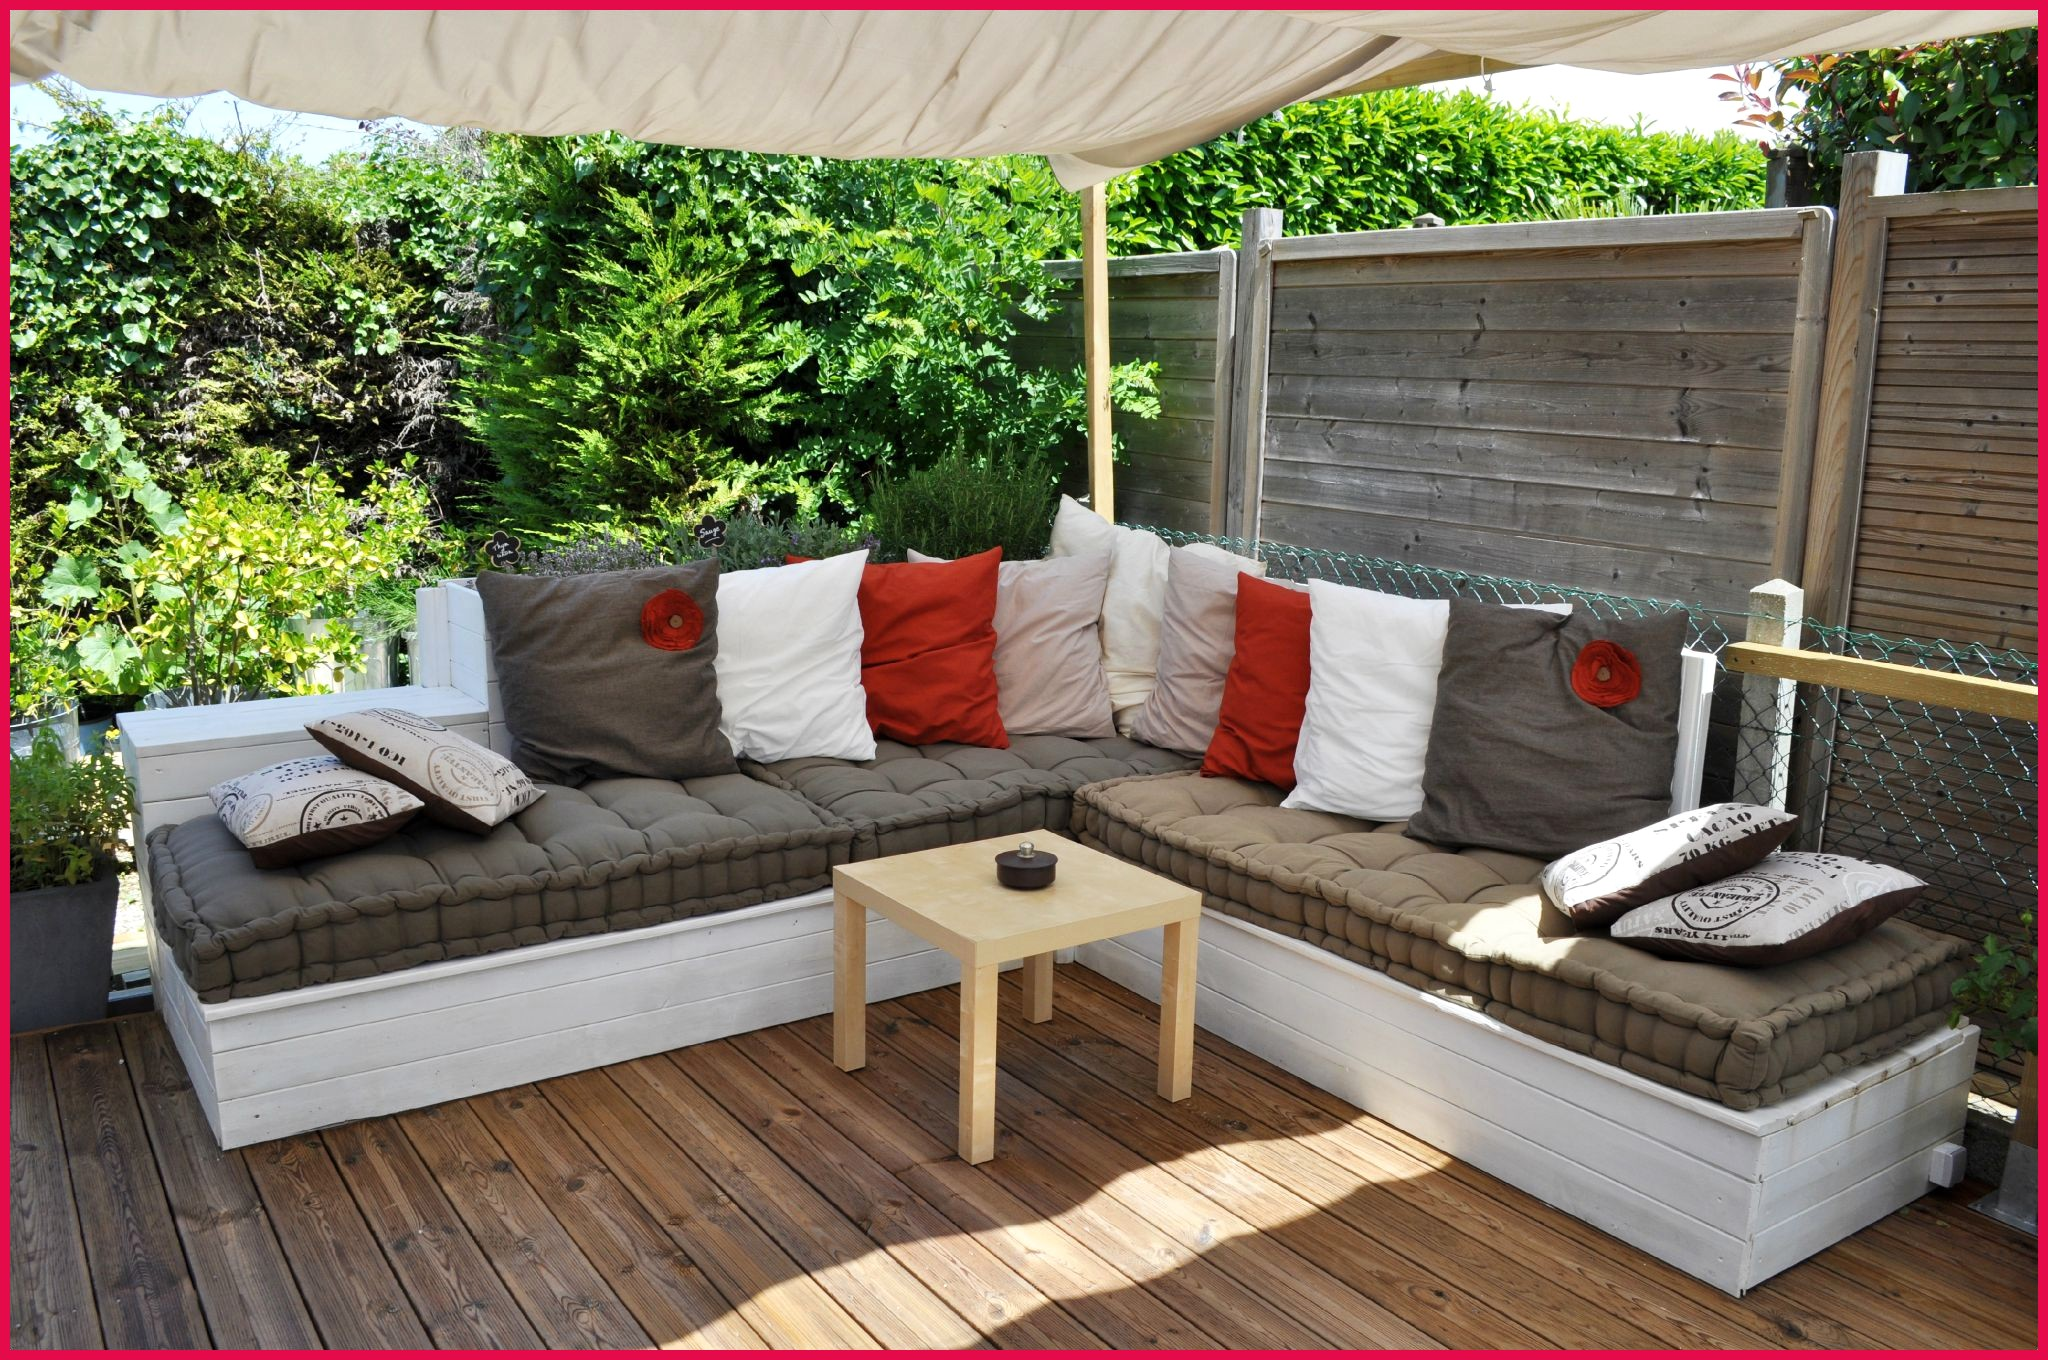 Salon de jardin en gros bambou - Abri de jardin et balancoire idée